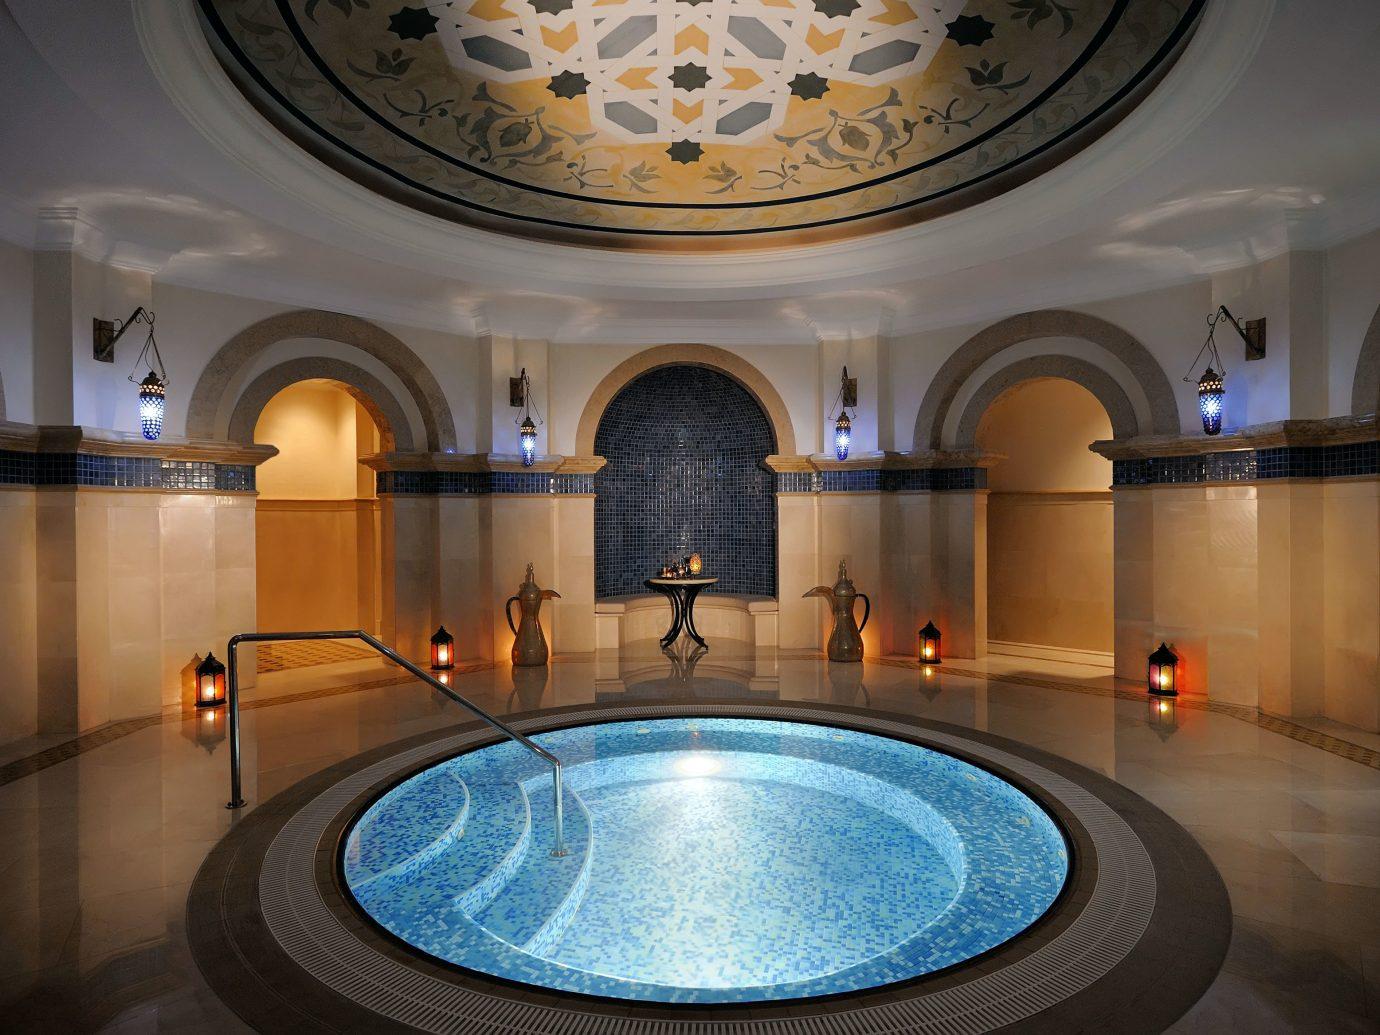 Dubai Elegant Hot tub Hot tub/Jacuzzi Hotels Lounge Luxury Luxury Travel Middle East Modern Patio Resort Terrace indoor wall swimming pool estate mansion Lobby ballroom